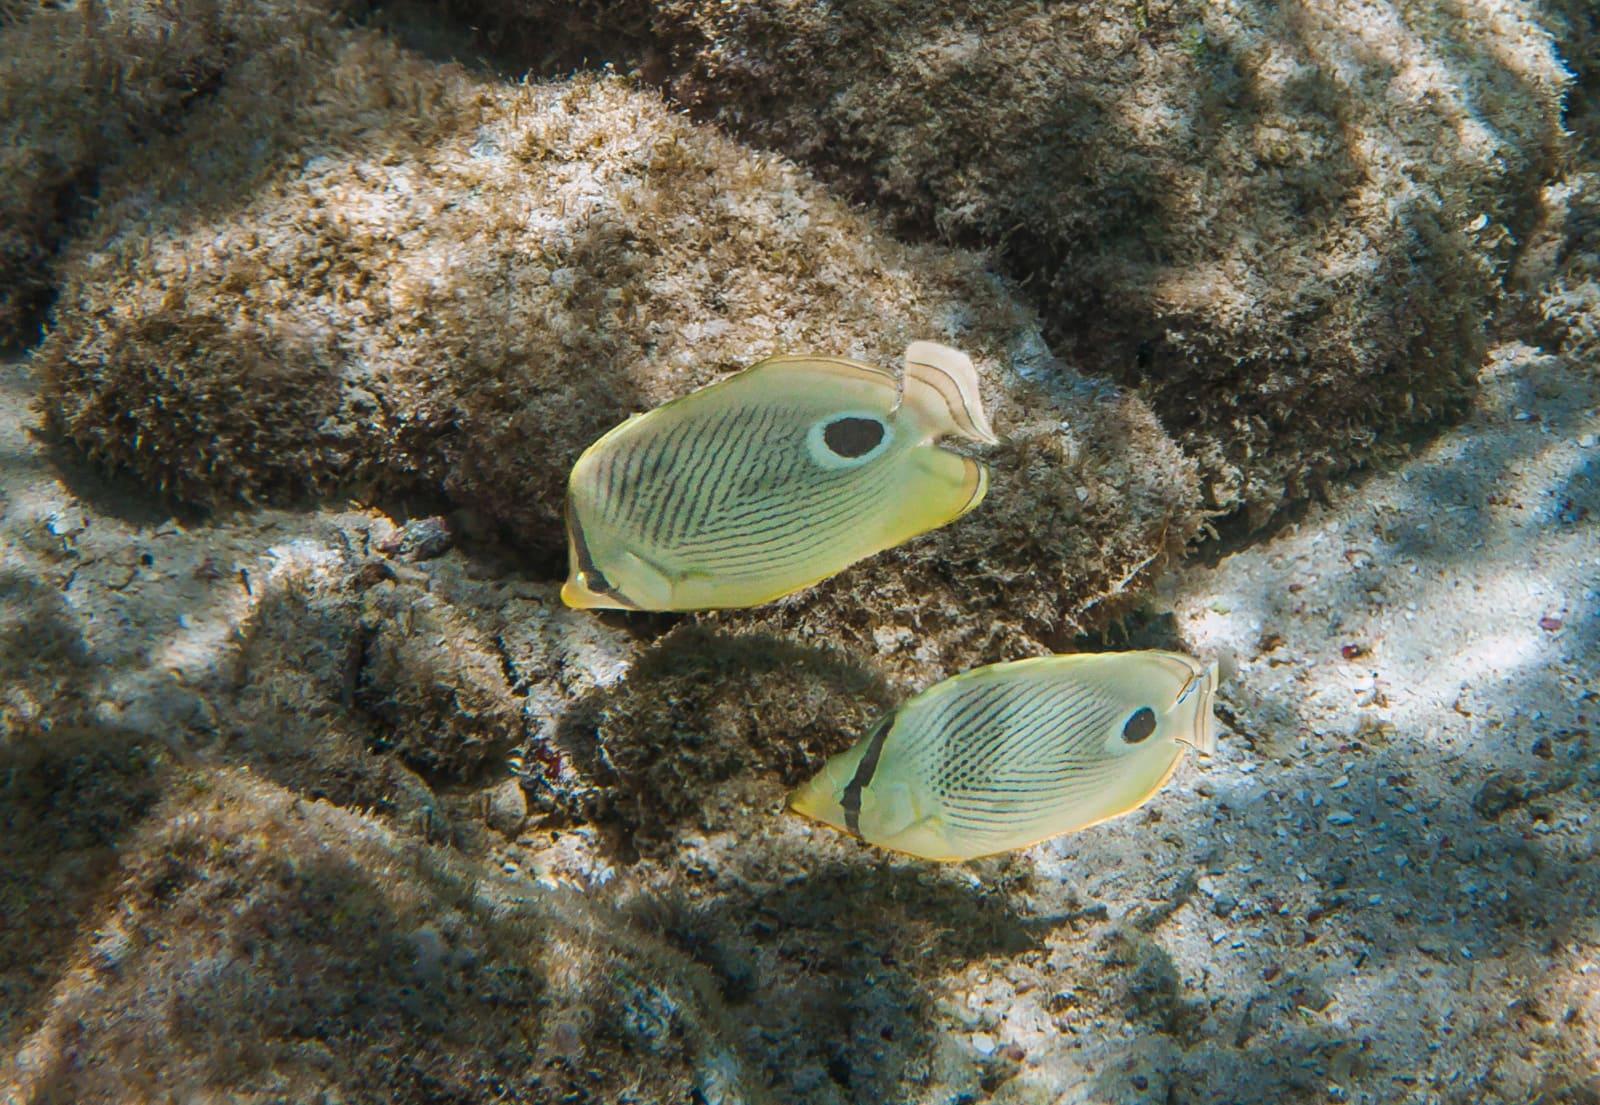 Foureye butterflyfish (Chaetodon capistratus) in Curacao